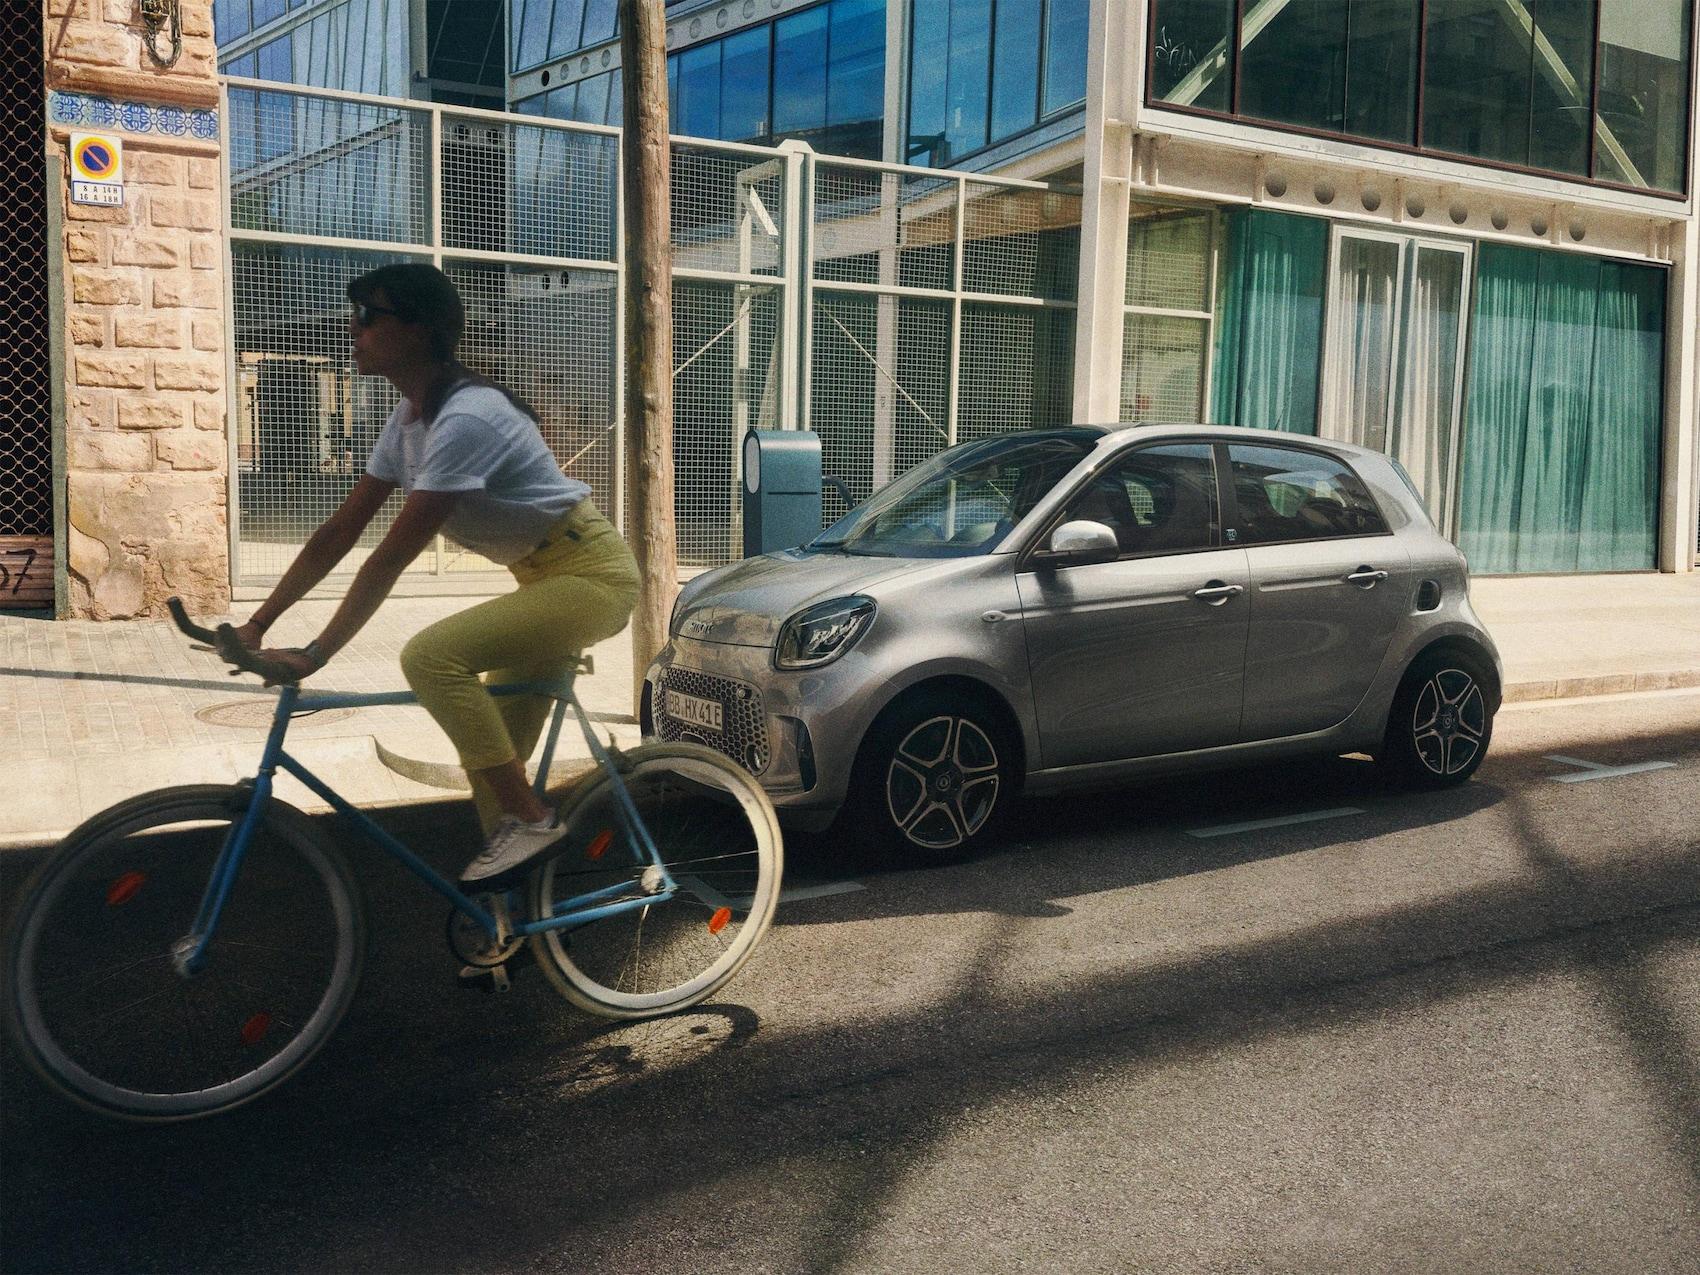 smart EQ forfour parkiran je pokraj rubnjaka. Prolazi biciklist.